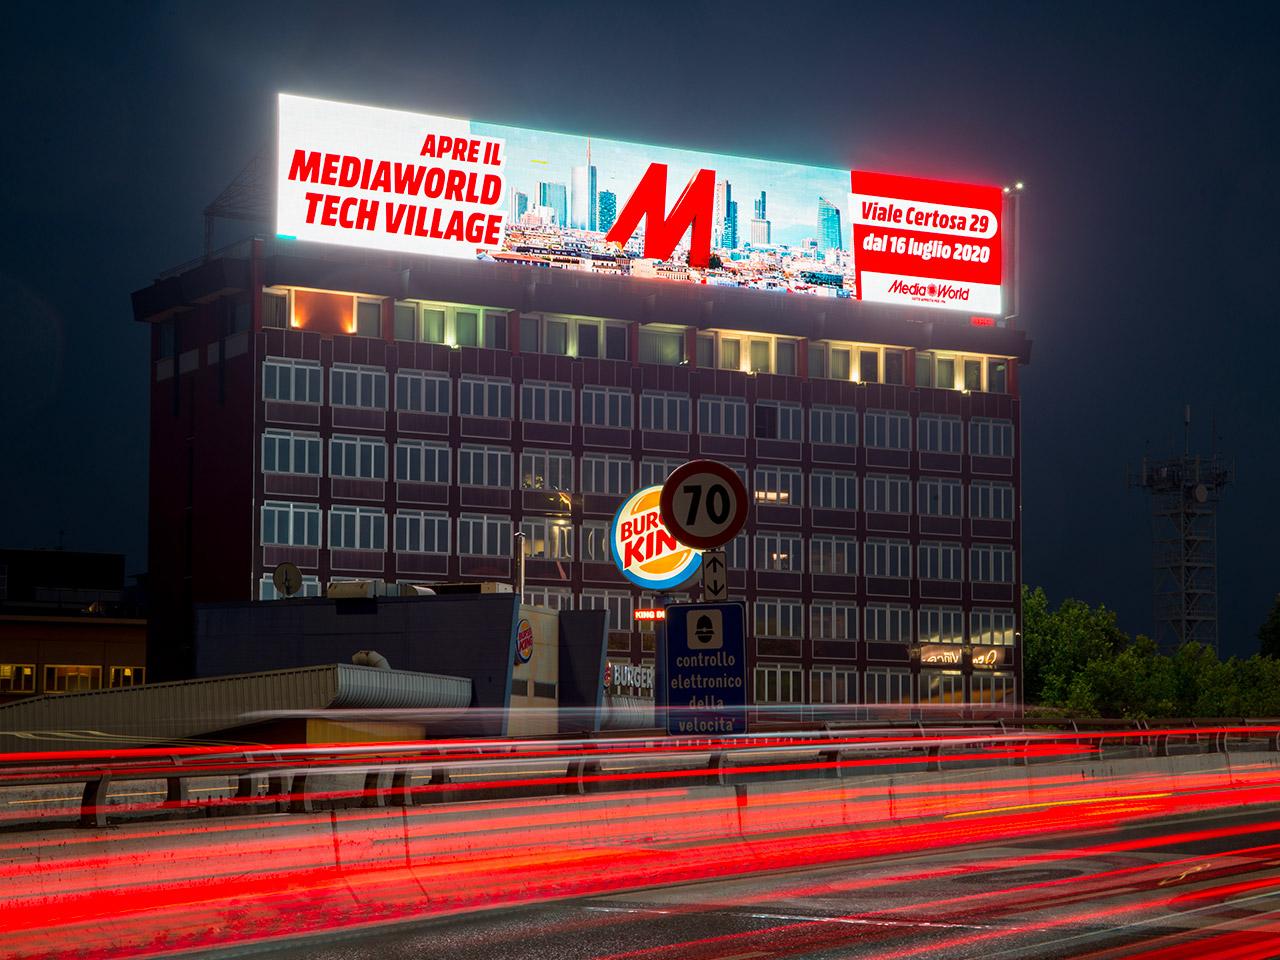 Maxi-billboard-maxischermo-led-su-tetto-giant-ledwall-1280x960-3